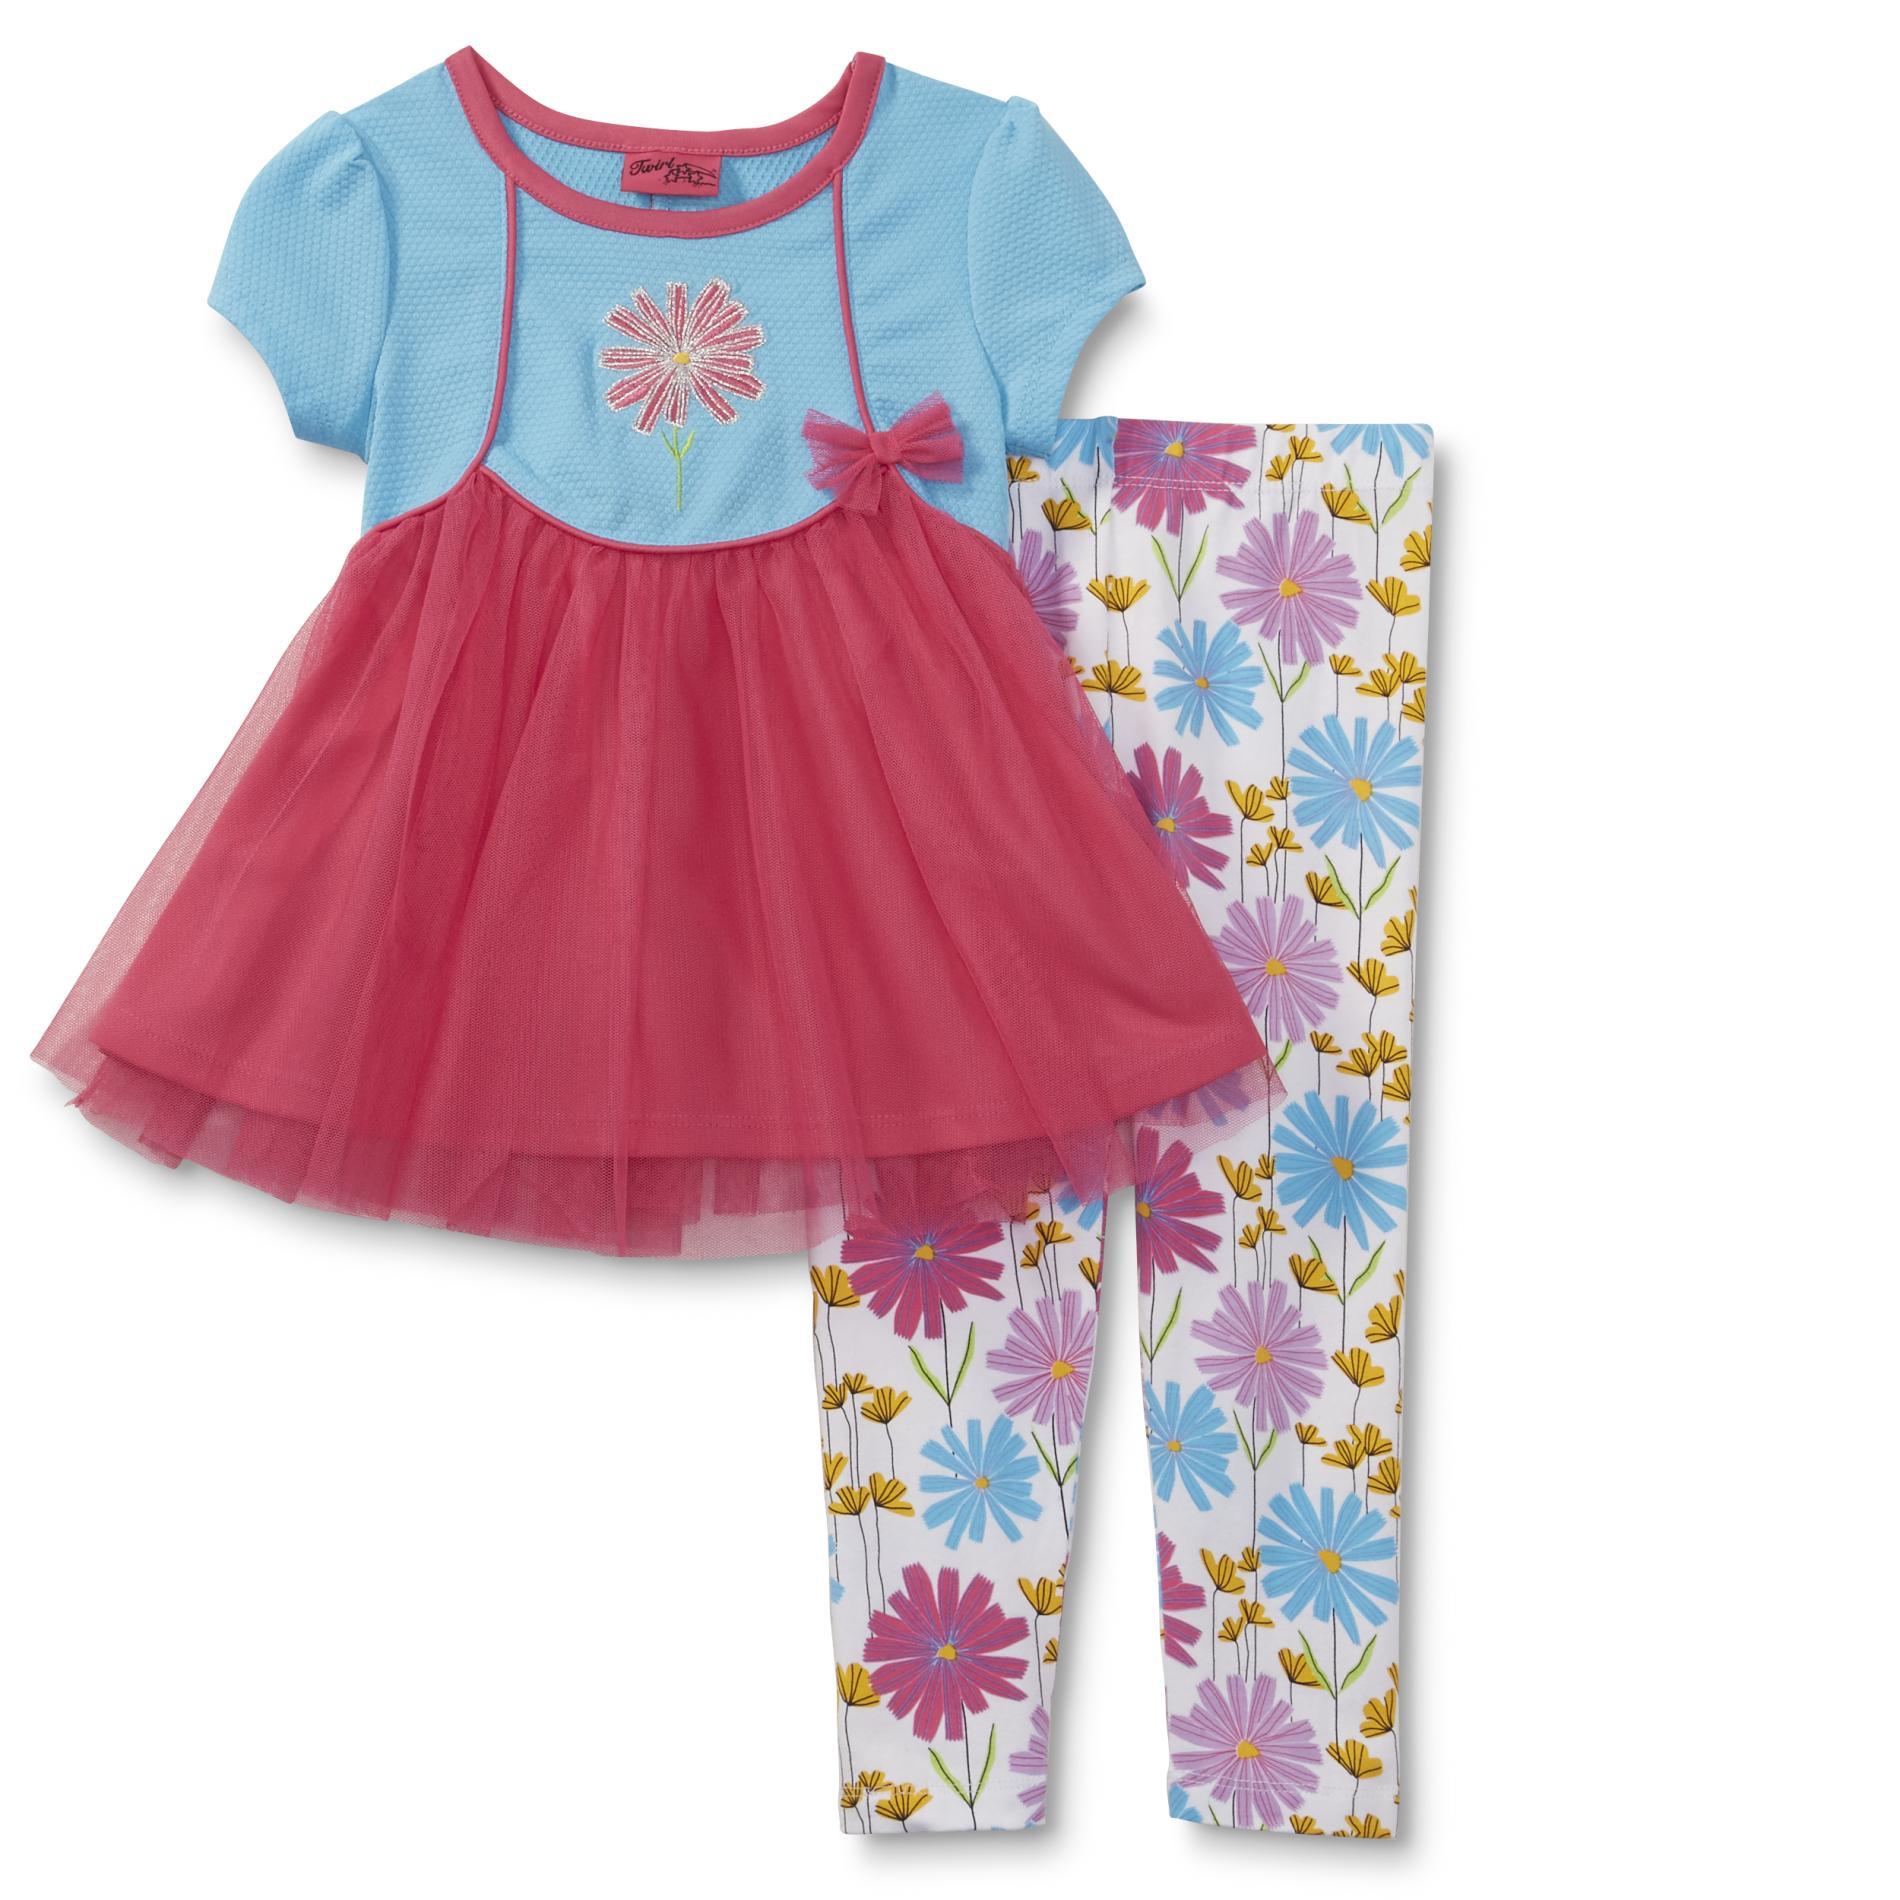 Twirl Infant & Toddler Girls' Tunic Top & Leggings - Floral PartNumber: 029VA93512012P MfgPartNumber: TWT828189